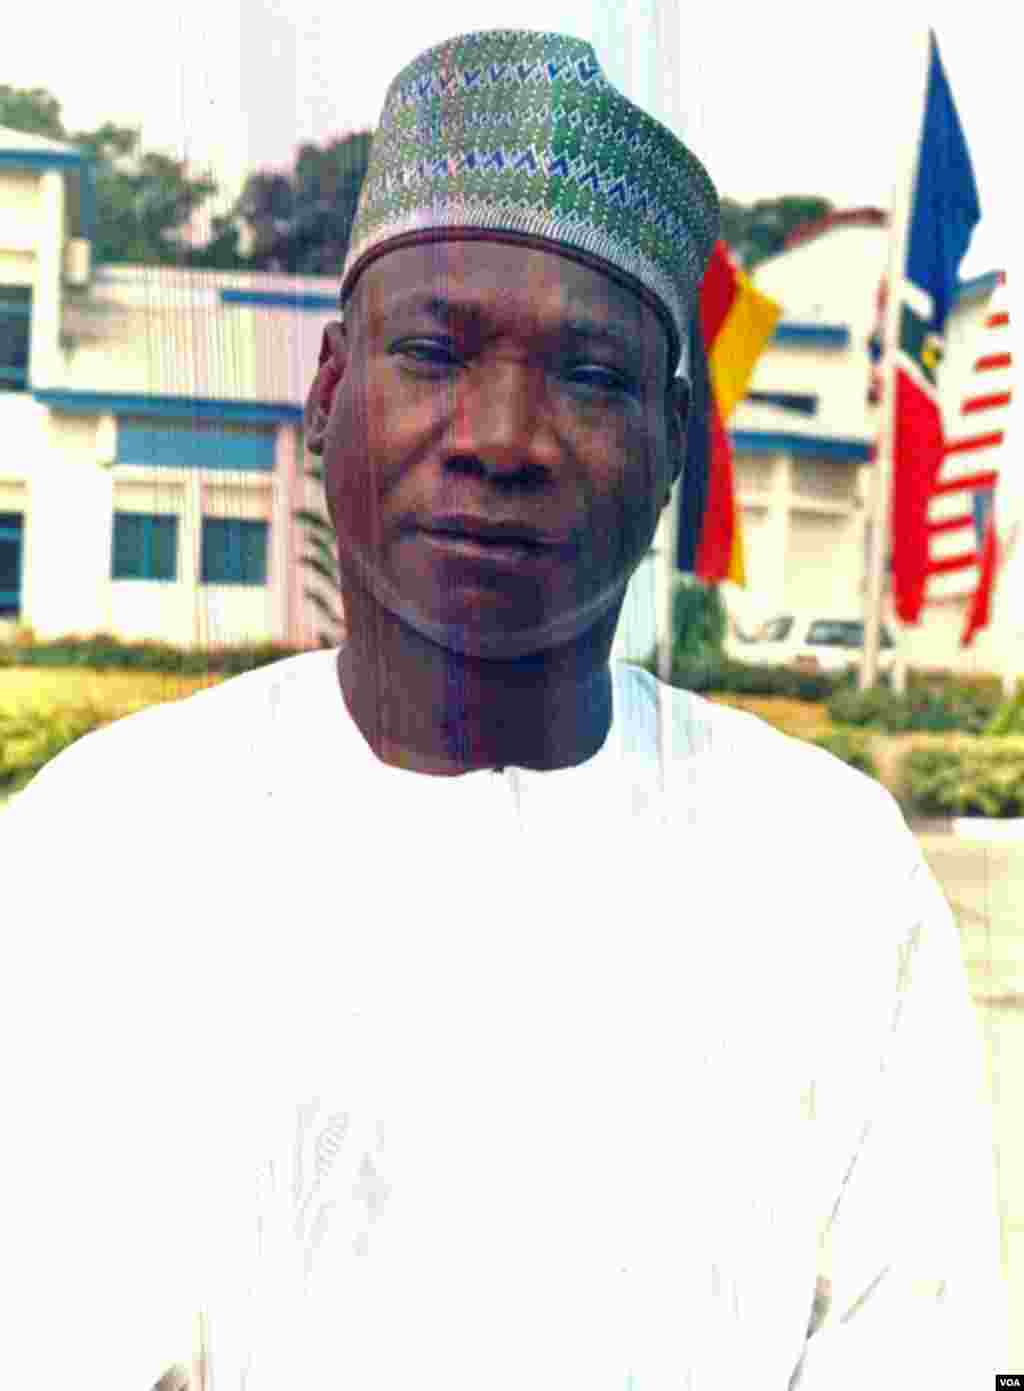 Bawa enjoys listening to Special English programs in Zamfara State, Nigeria.